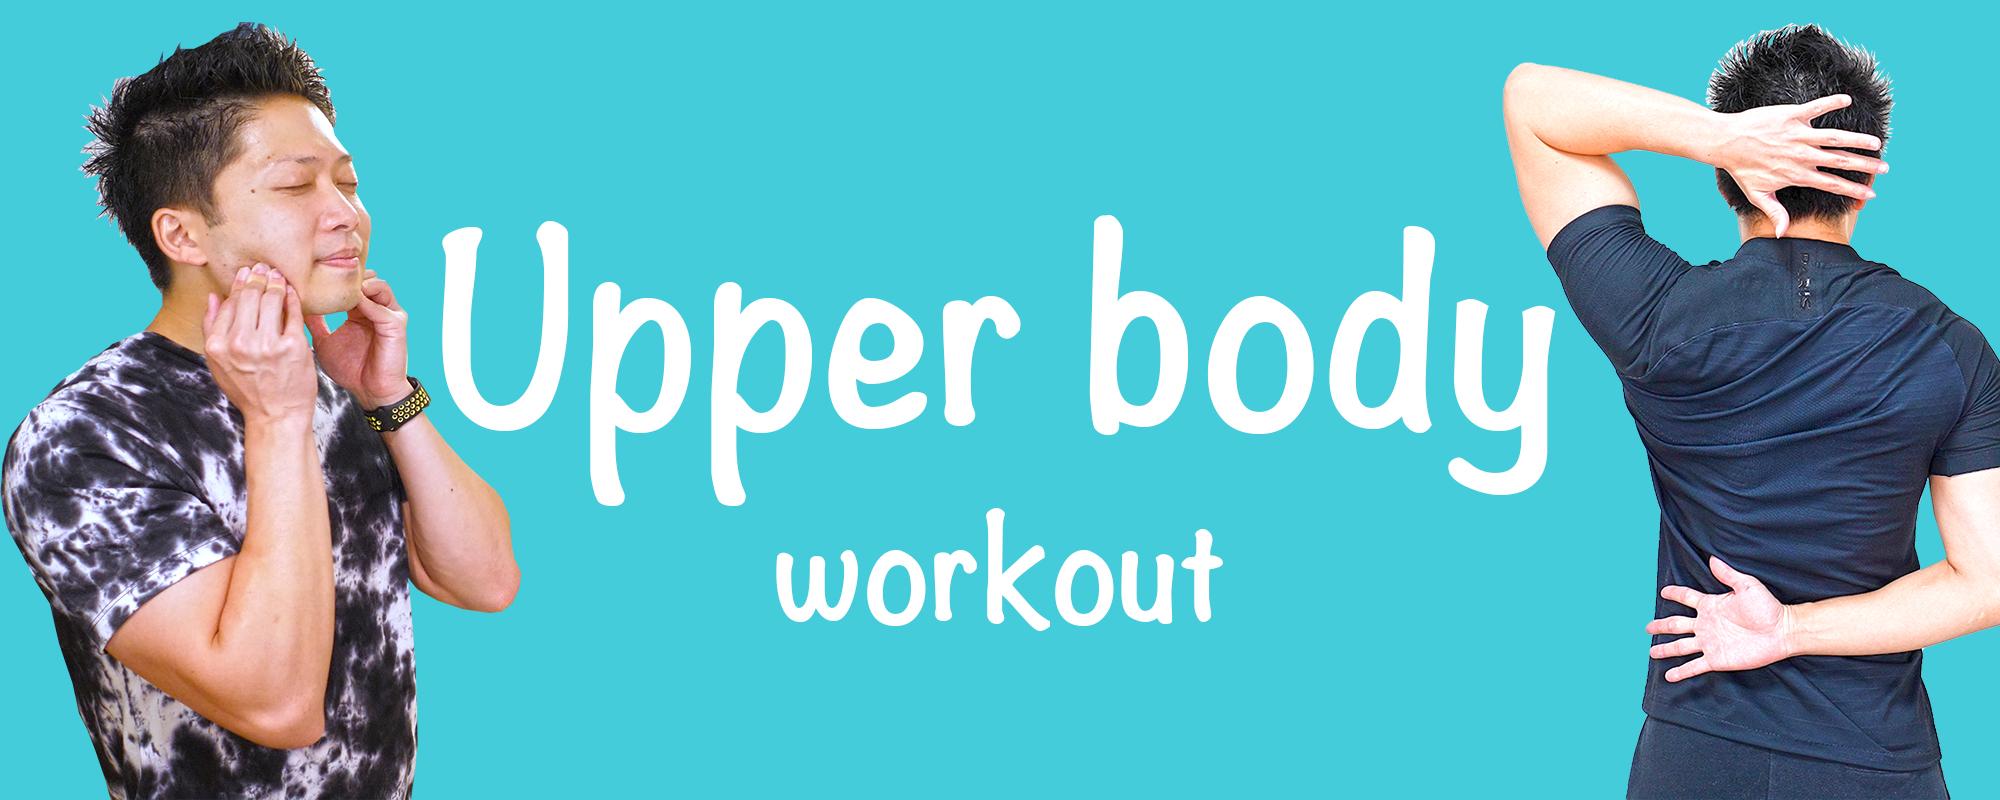 Upper body 4  weeks program